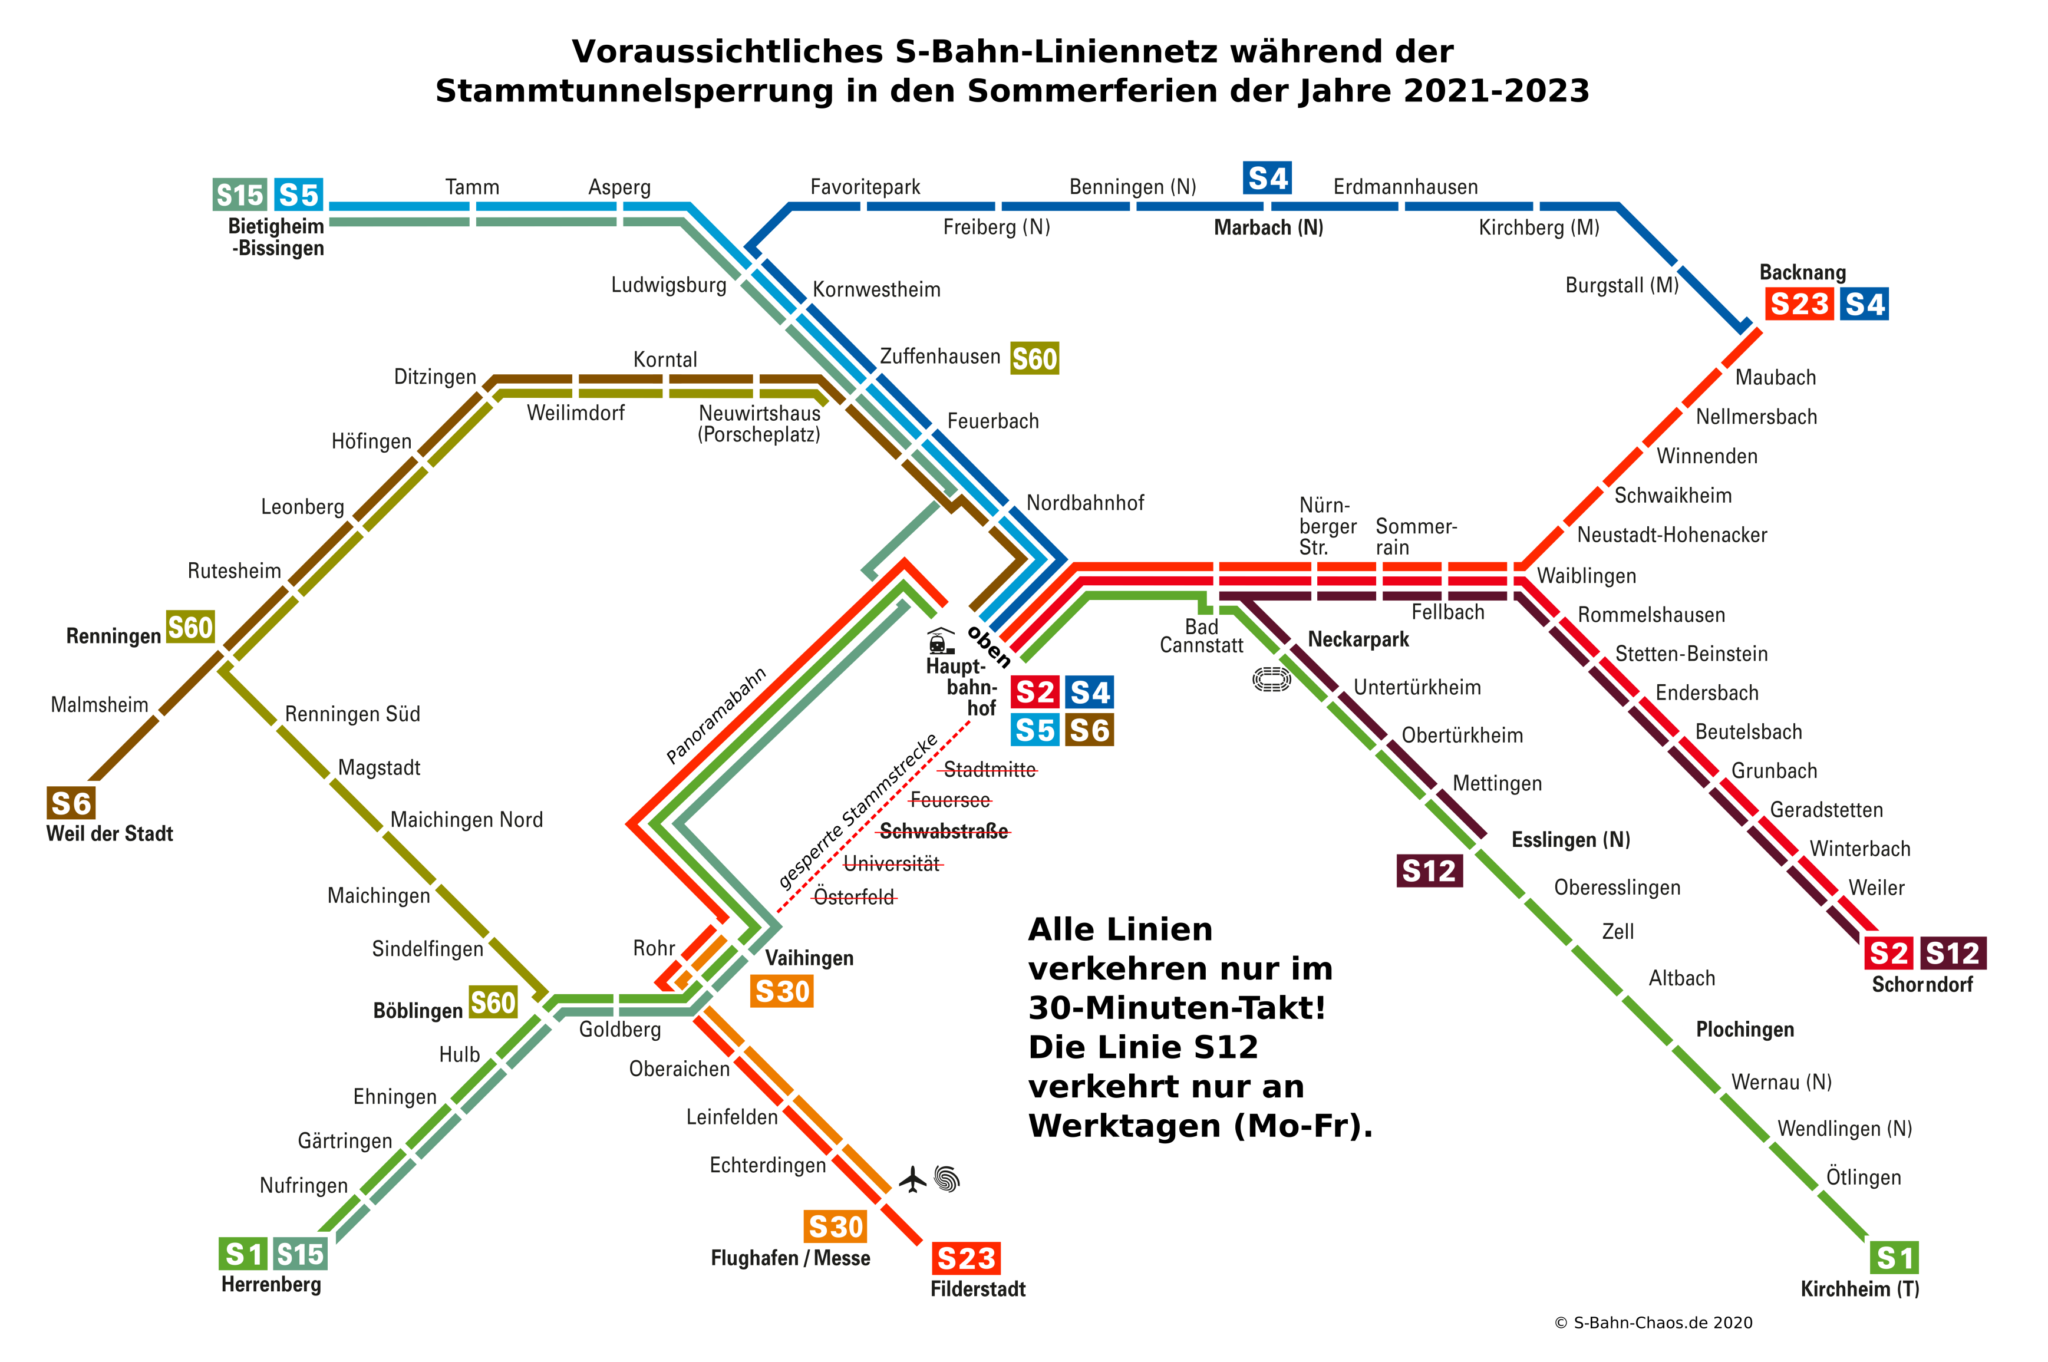 https://s-bahn-chaos.de/wp-content/uploads/2020/08/Sperrung-S-Bahn-Sommer-regulaer-Druck-neu-S12-Esslingen-2048x1362.png